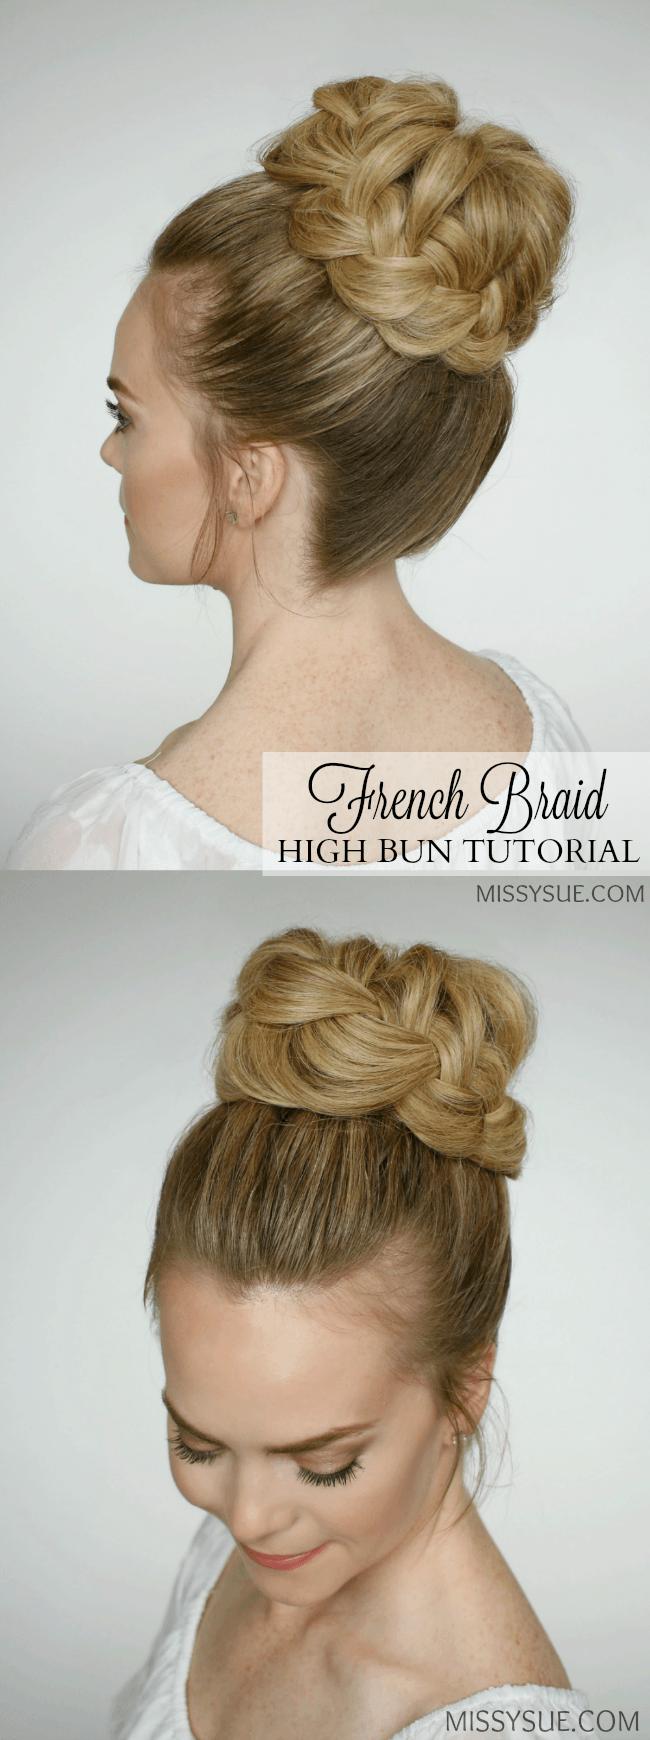 Frenchbraidhighbunhairstyletutorial Hair Tutorials - High bun hairstyle tutorial